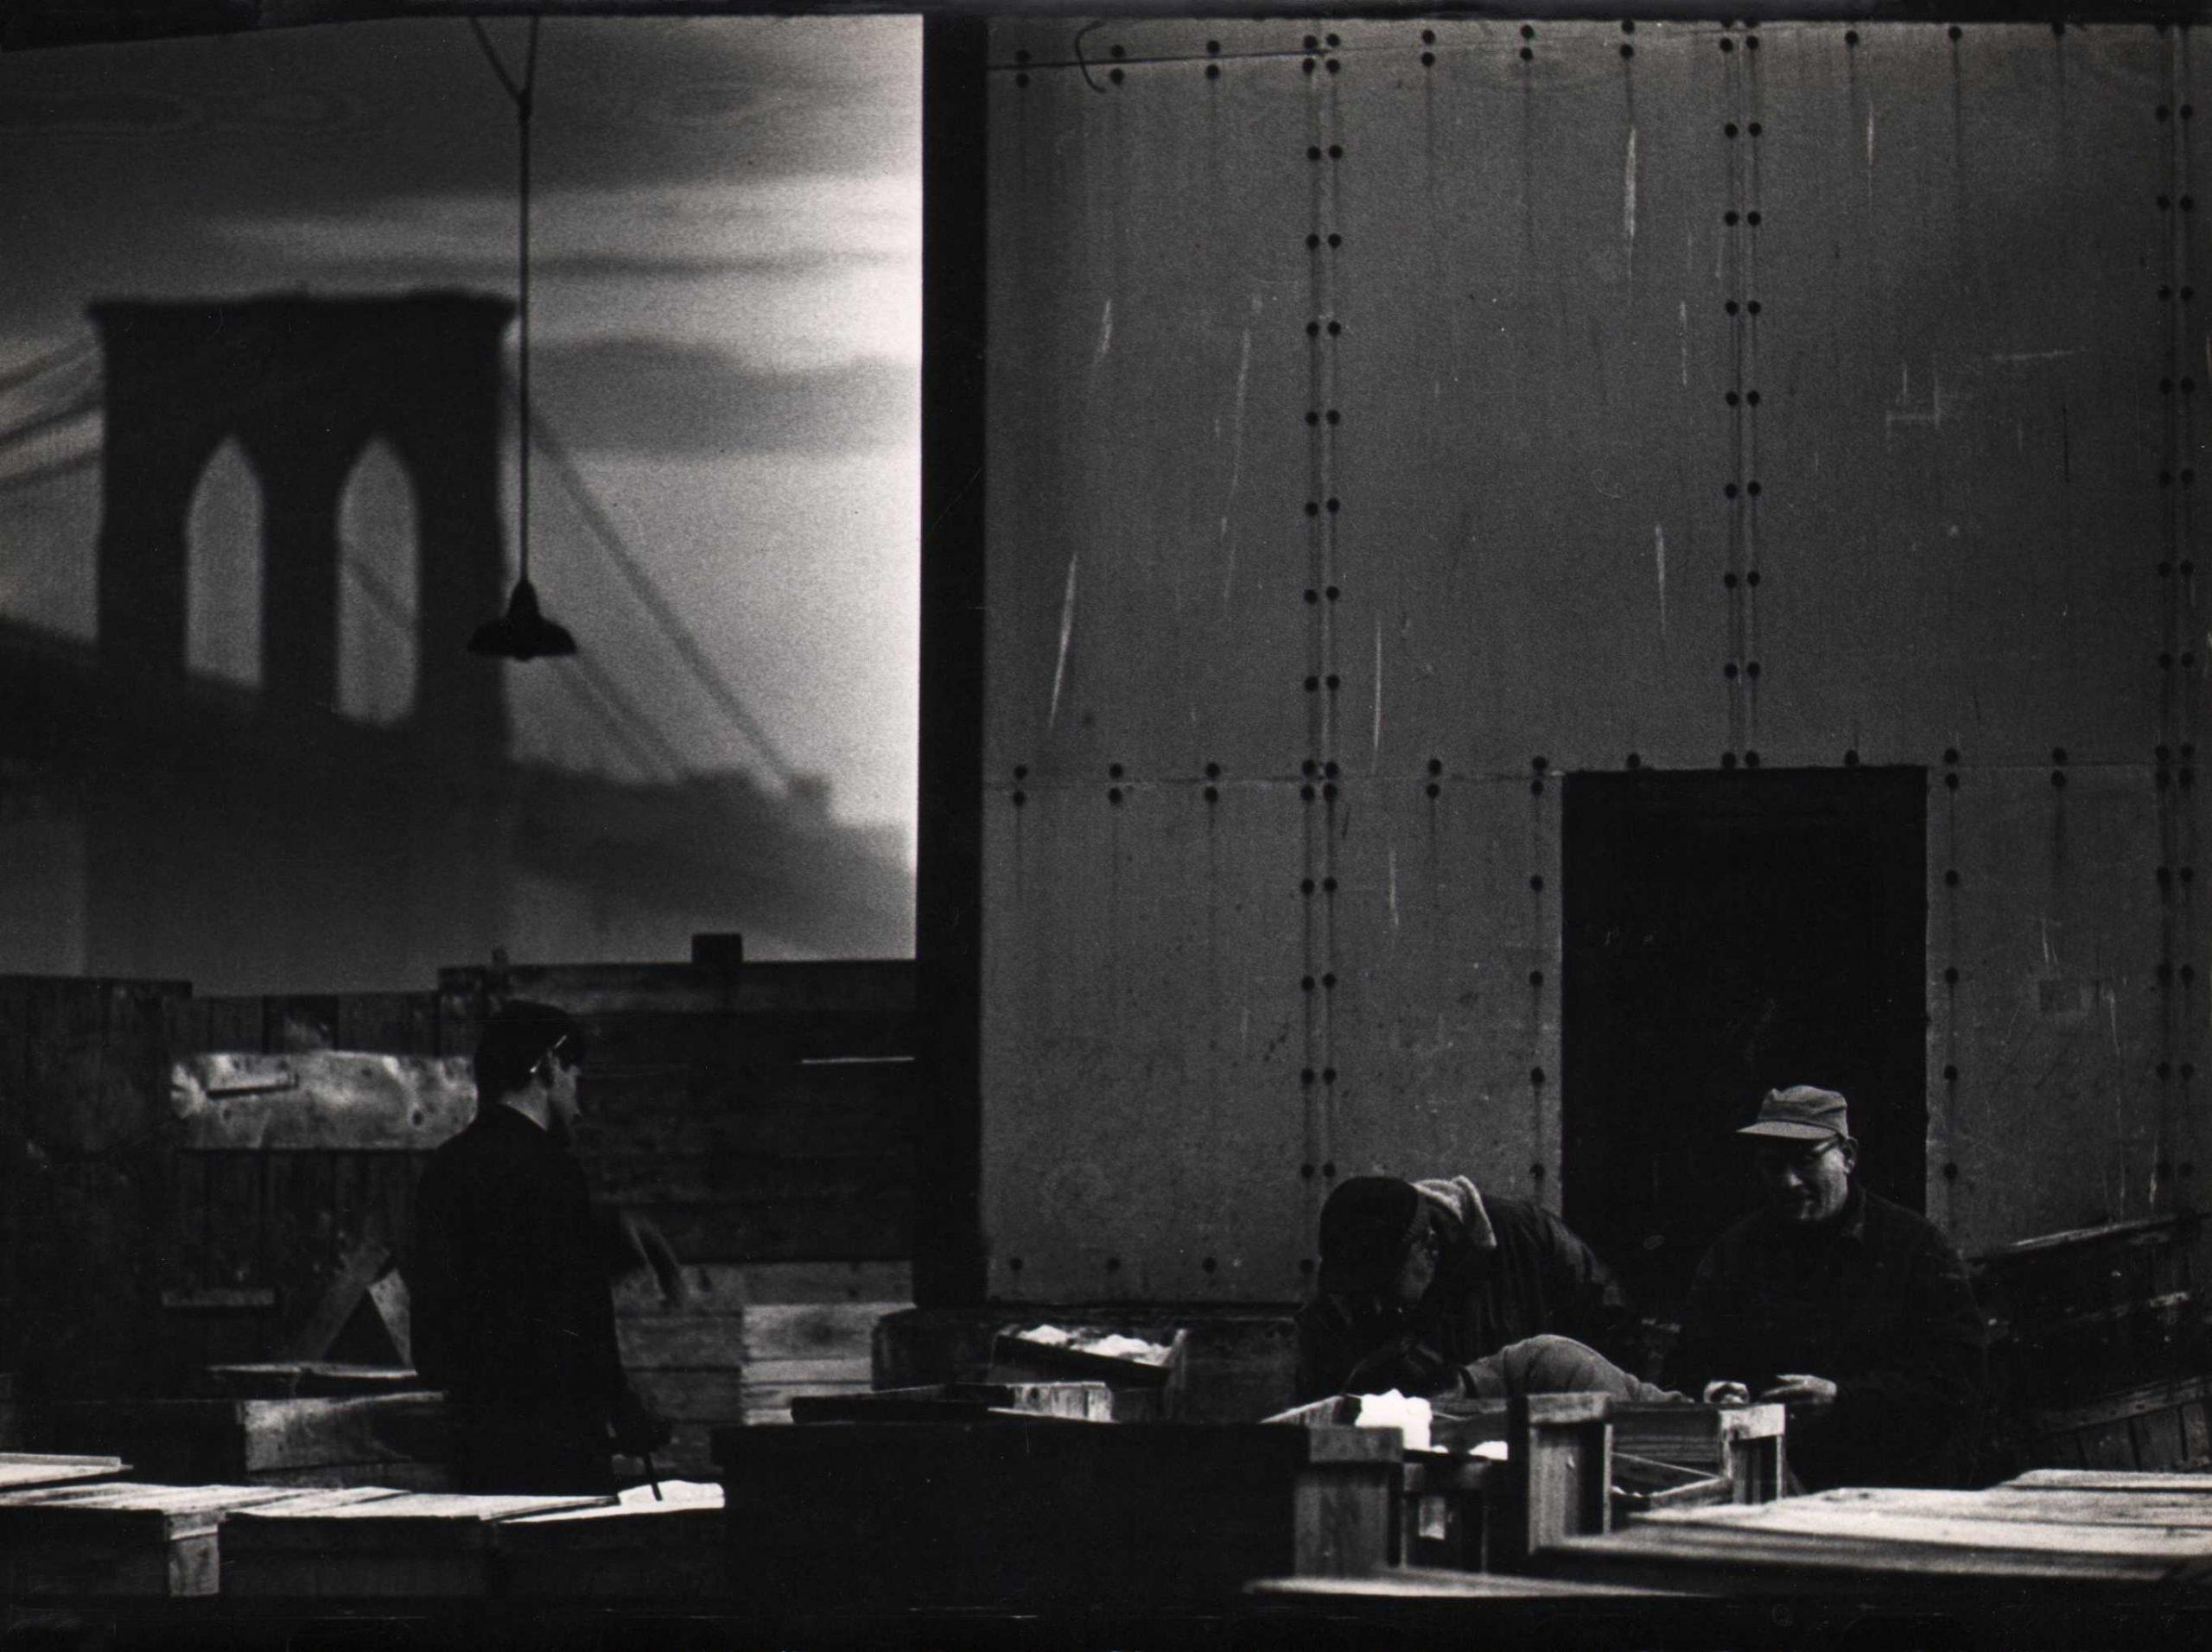 Jan Lukas, New York, Fulton Fishmarket, 1964